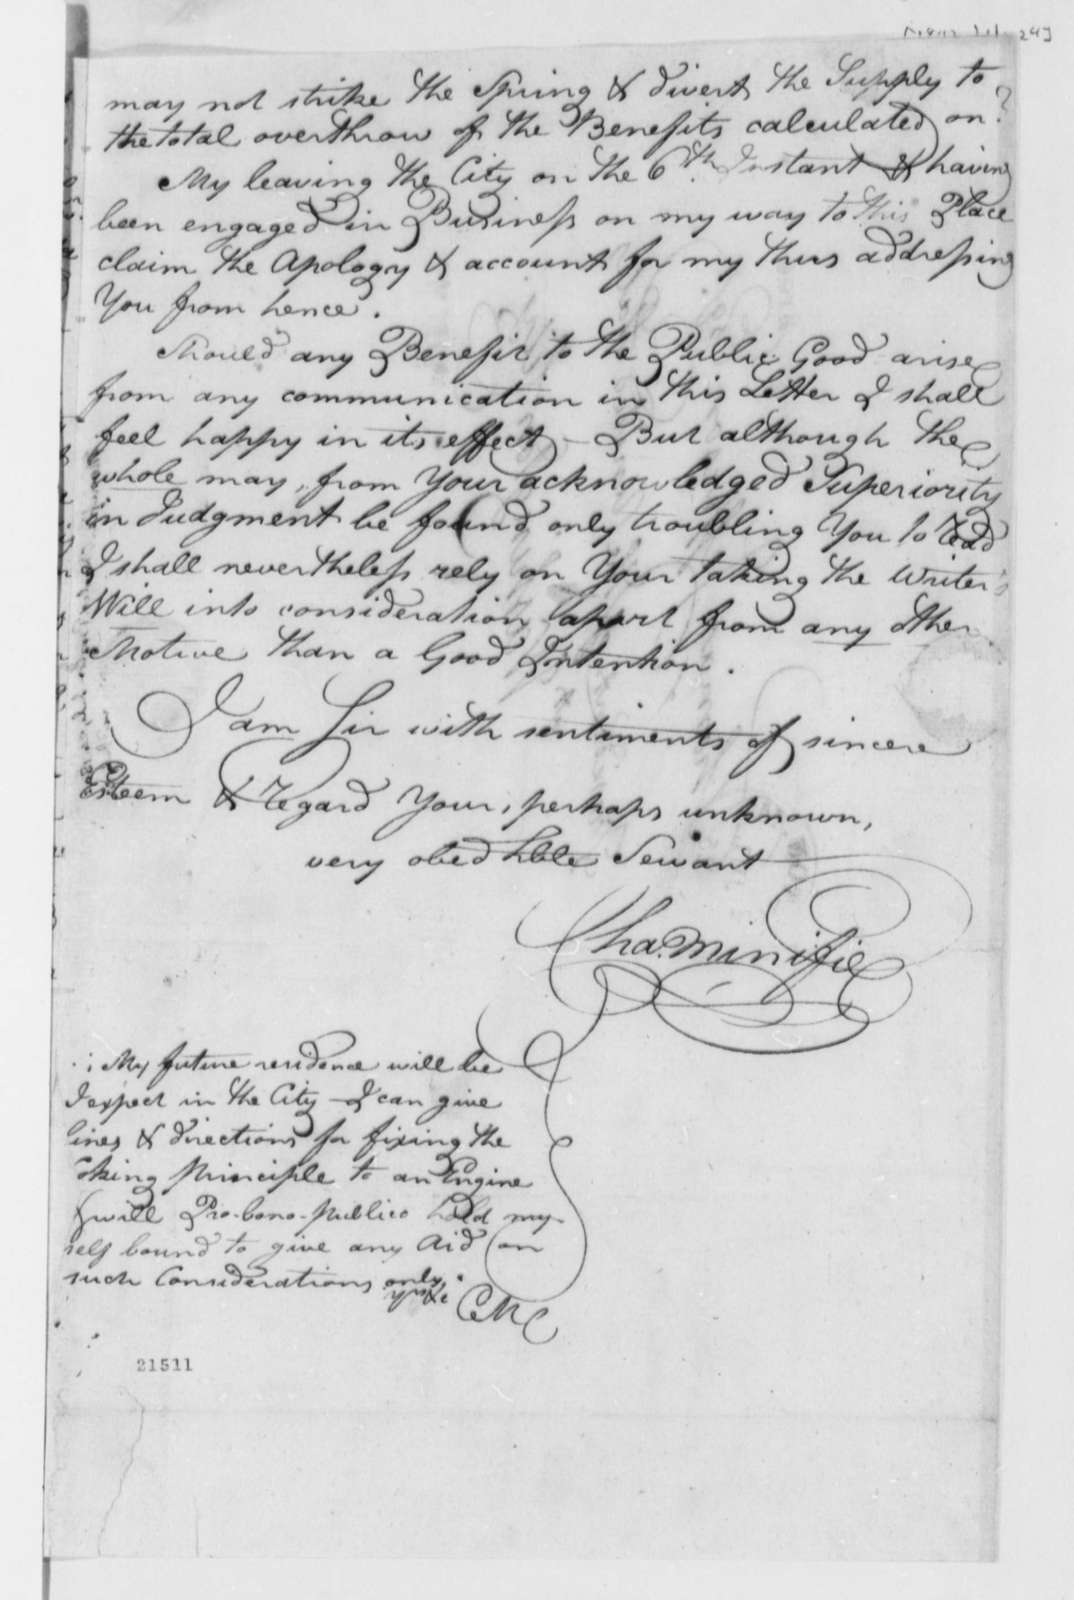 Charles Minifie to Thomas Jefferson, July 24, 1802